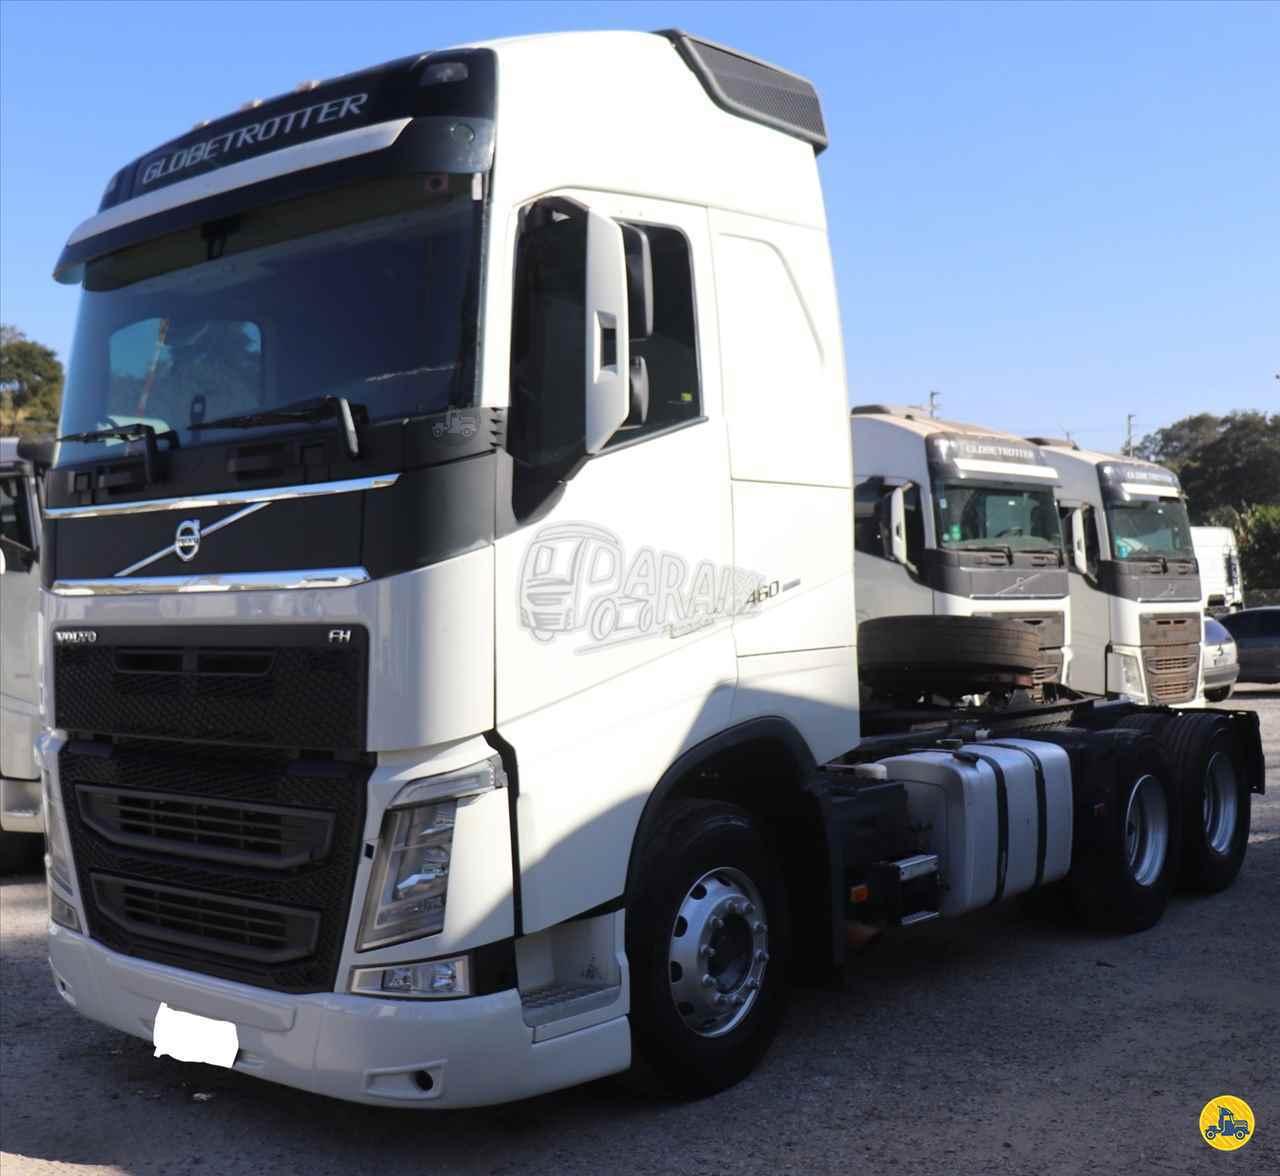 CAMINHAO VOLVO VOLVO FH 460 Chassis Truck 6x2 Paraíso Pesados ARACARIGUAMA SÃO PAULO SP